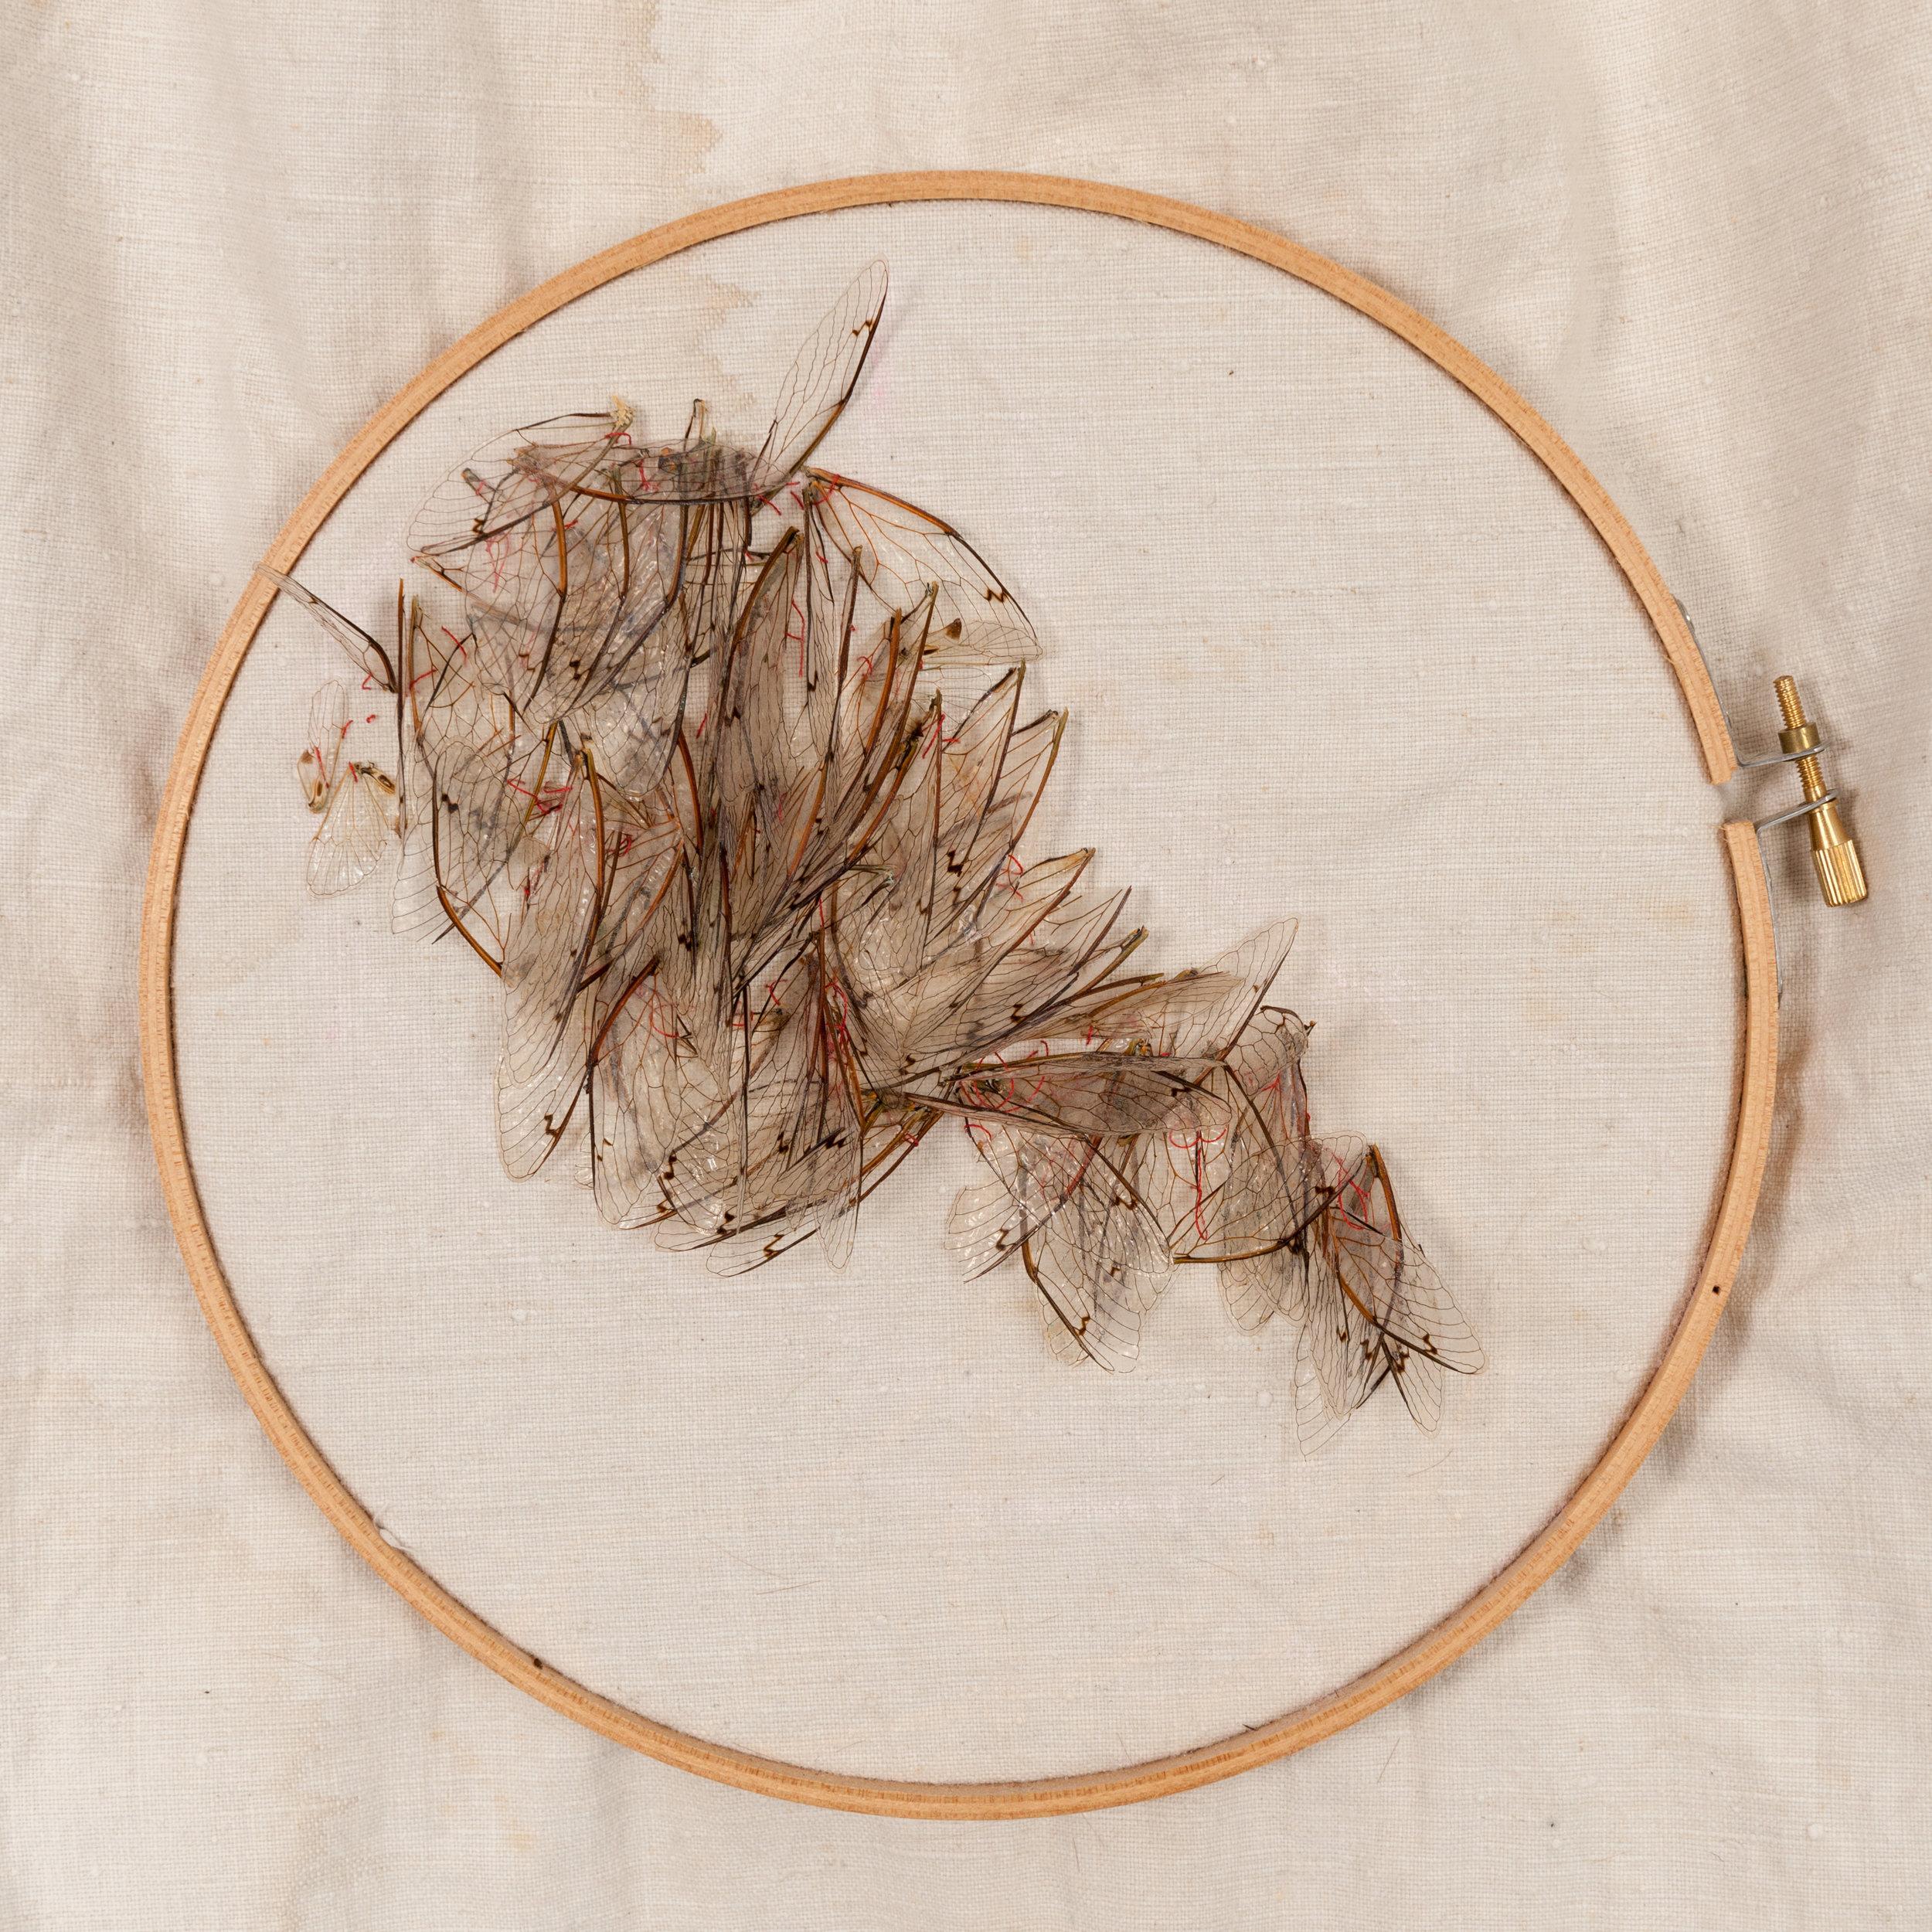 Rapacious Deeds (detail) - Linen, red thread, locust wings, wood frame, dimensions 85cm x 69cm, Image-Nu Image.jpg